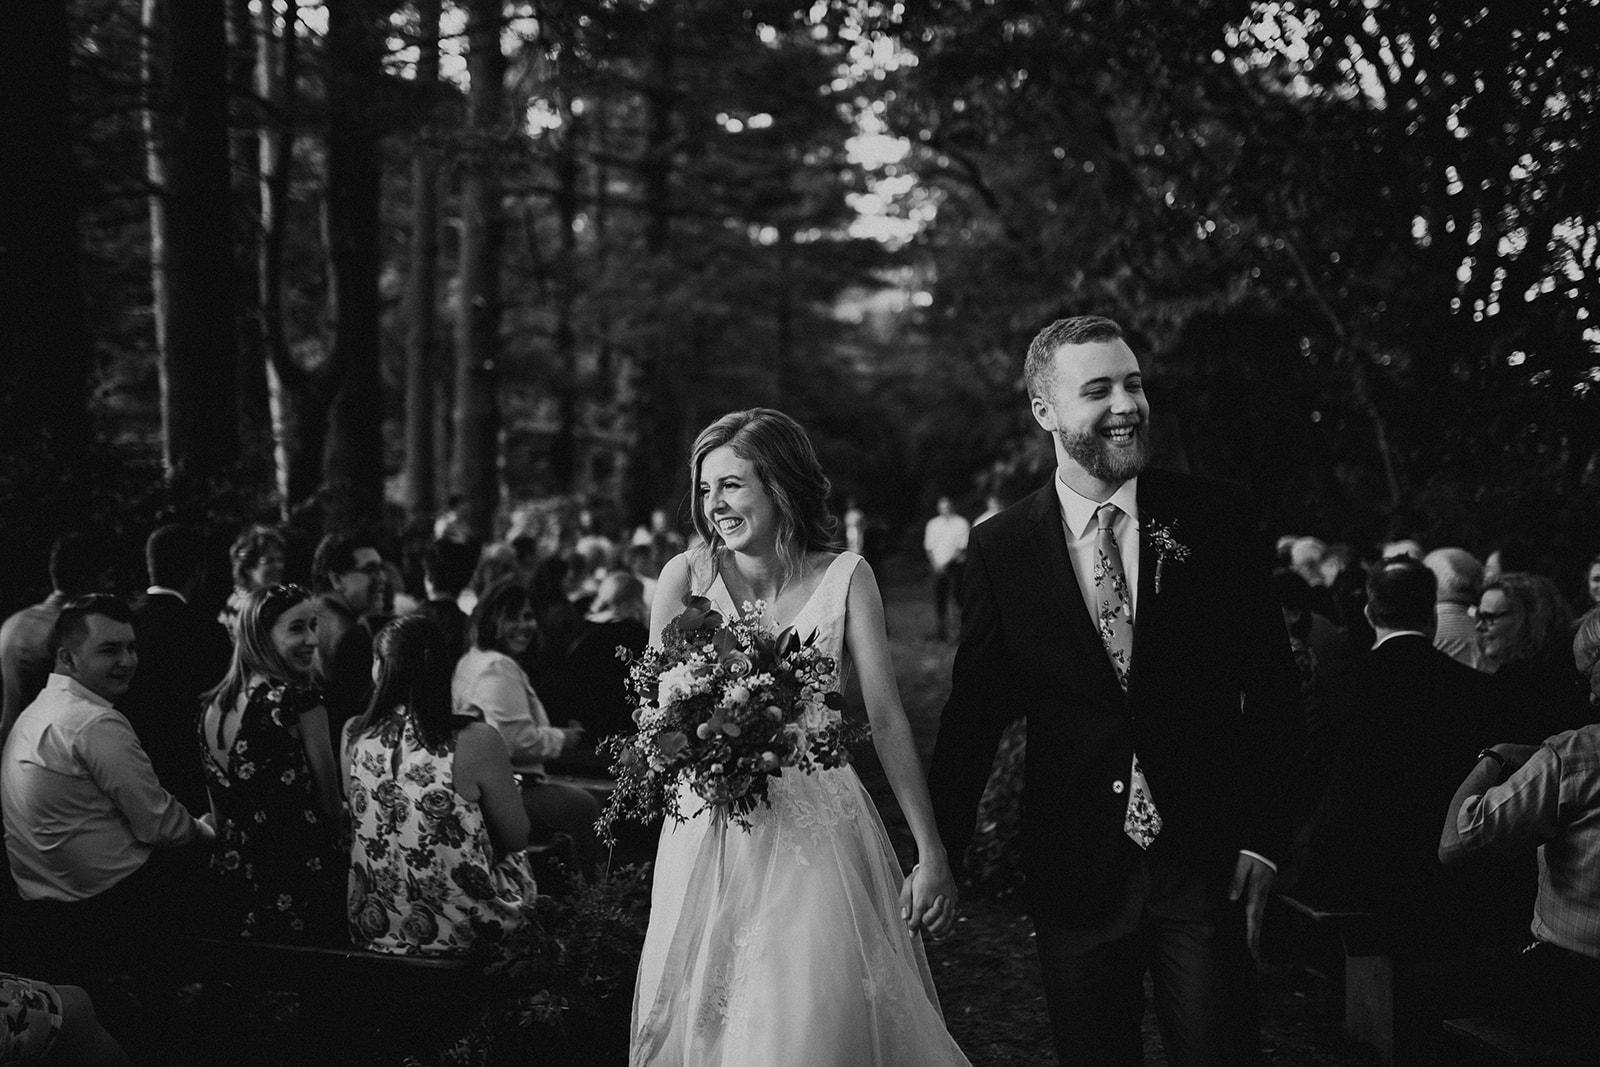 camp_wokanda_peoria_illinois_wedding_photographer_wright_photographs_bliese_0287.jpg